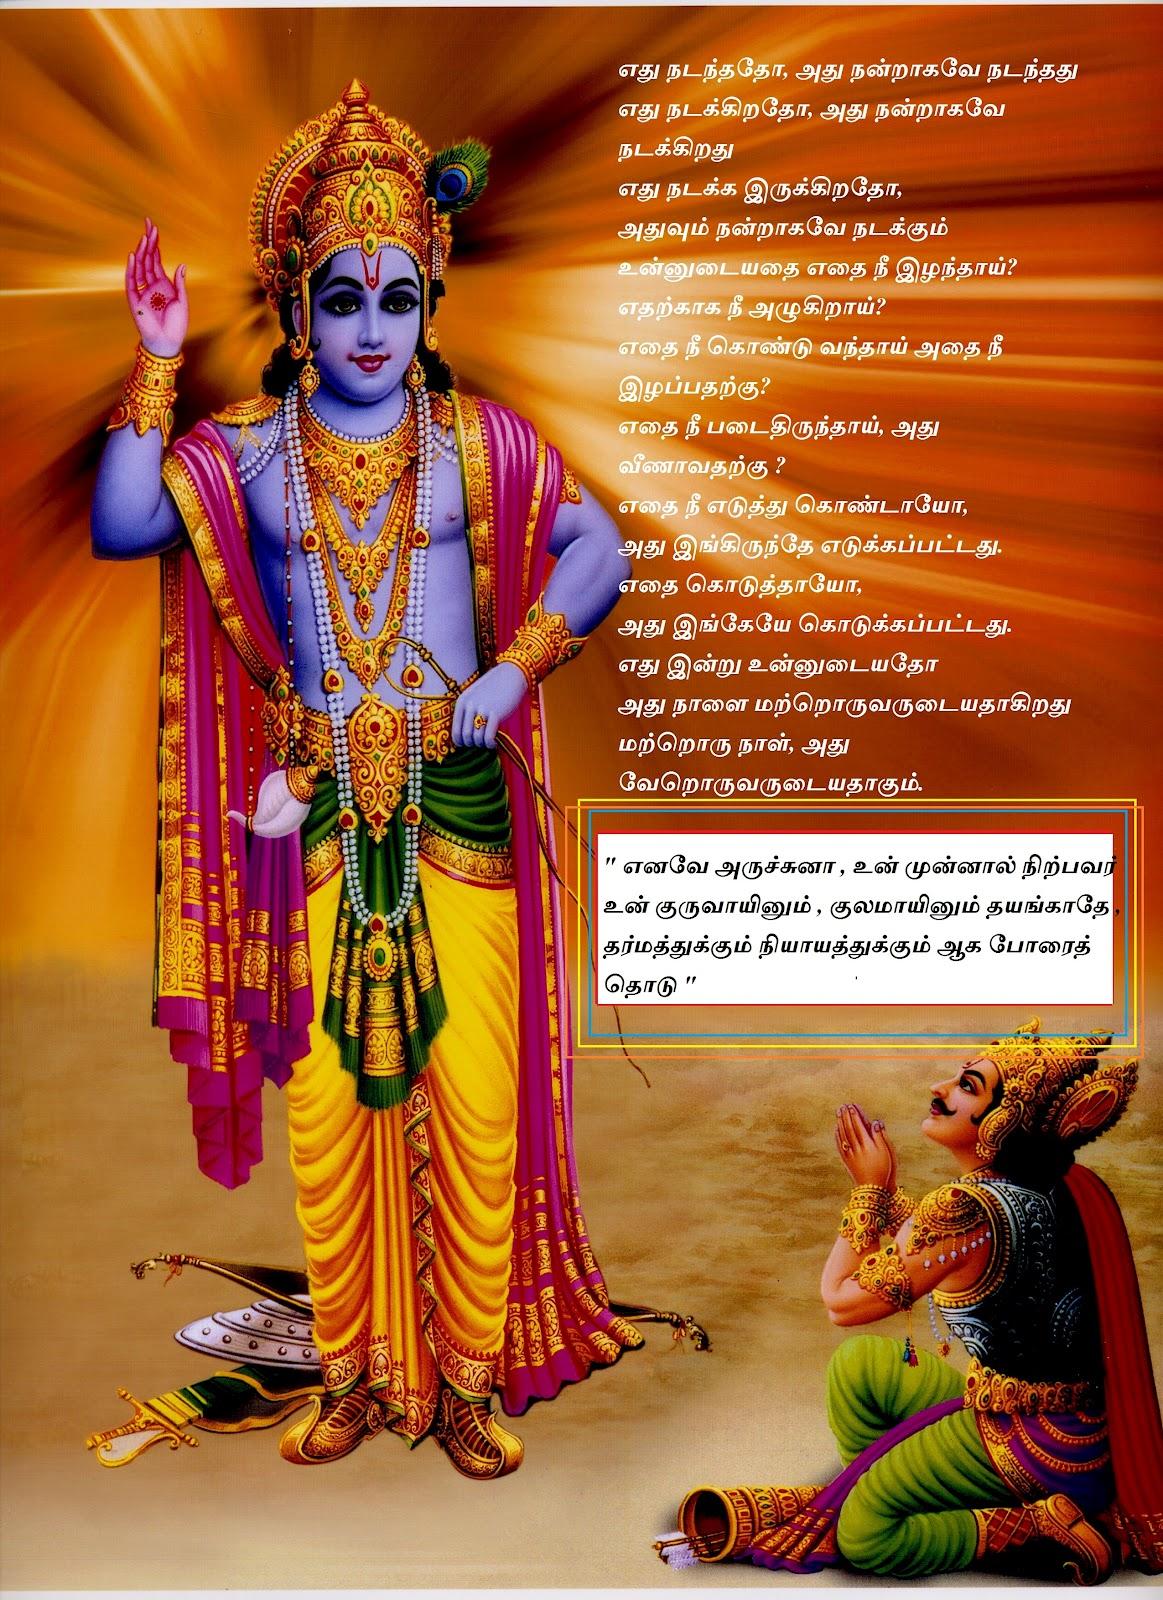 BHAGAVATH GEETHA TAMIL FREE DOWNLOAD